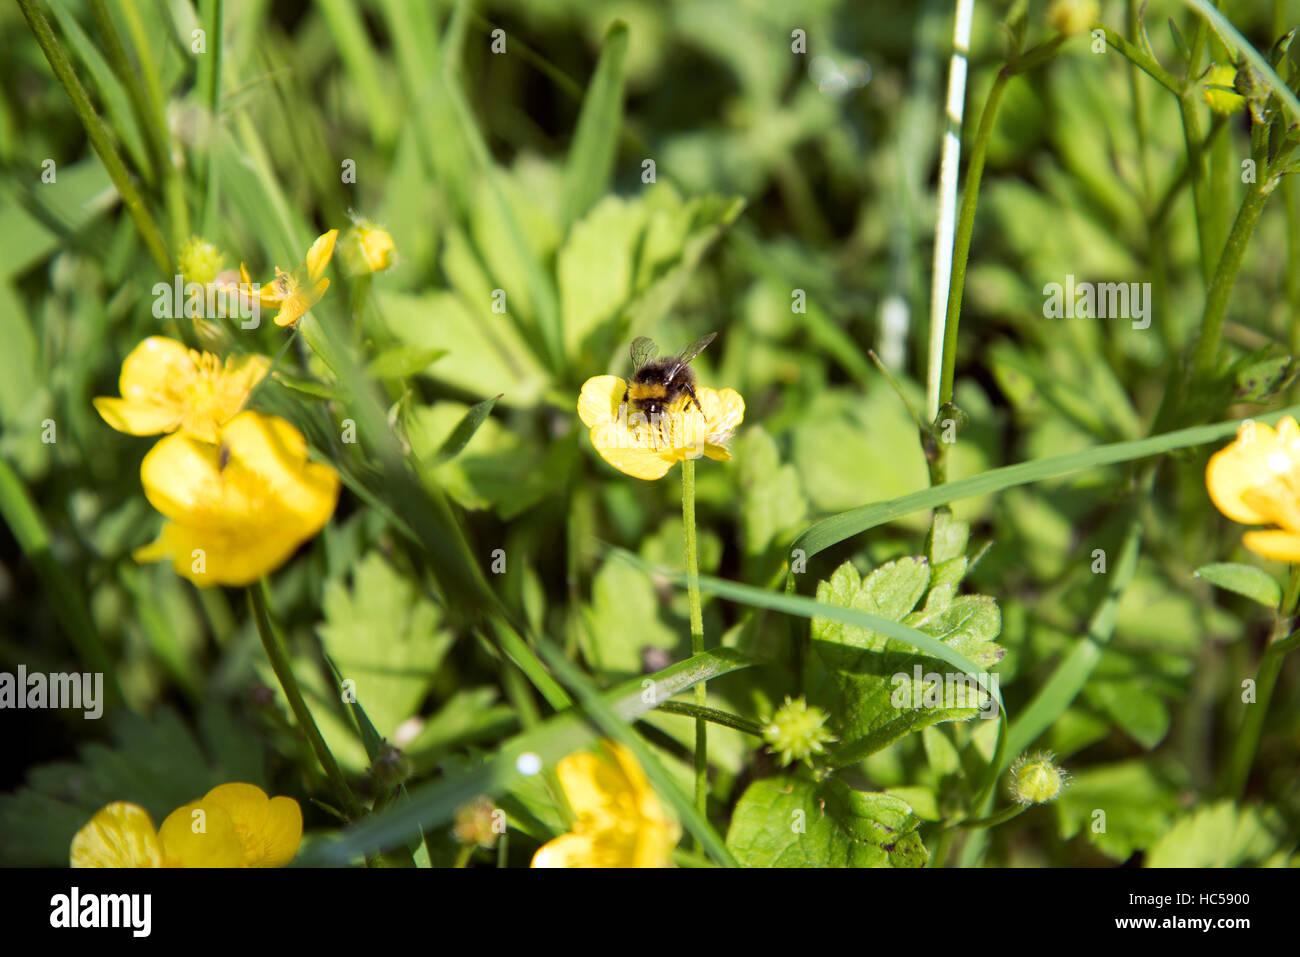 Buttercups buttercup growing Hampstead Heath - Stock Image